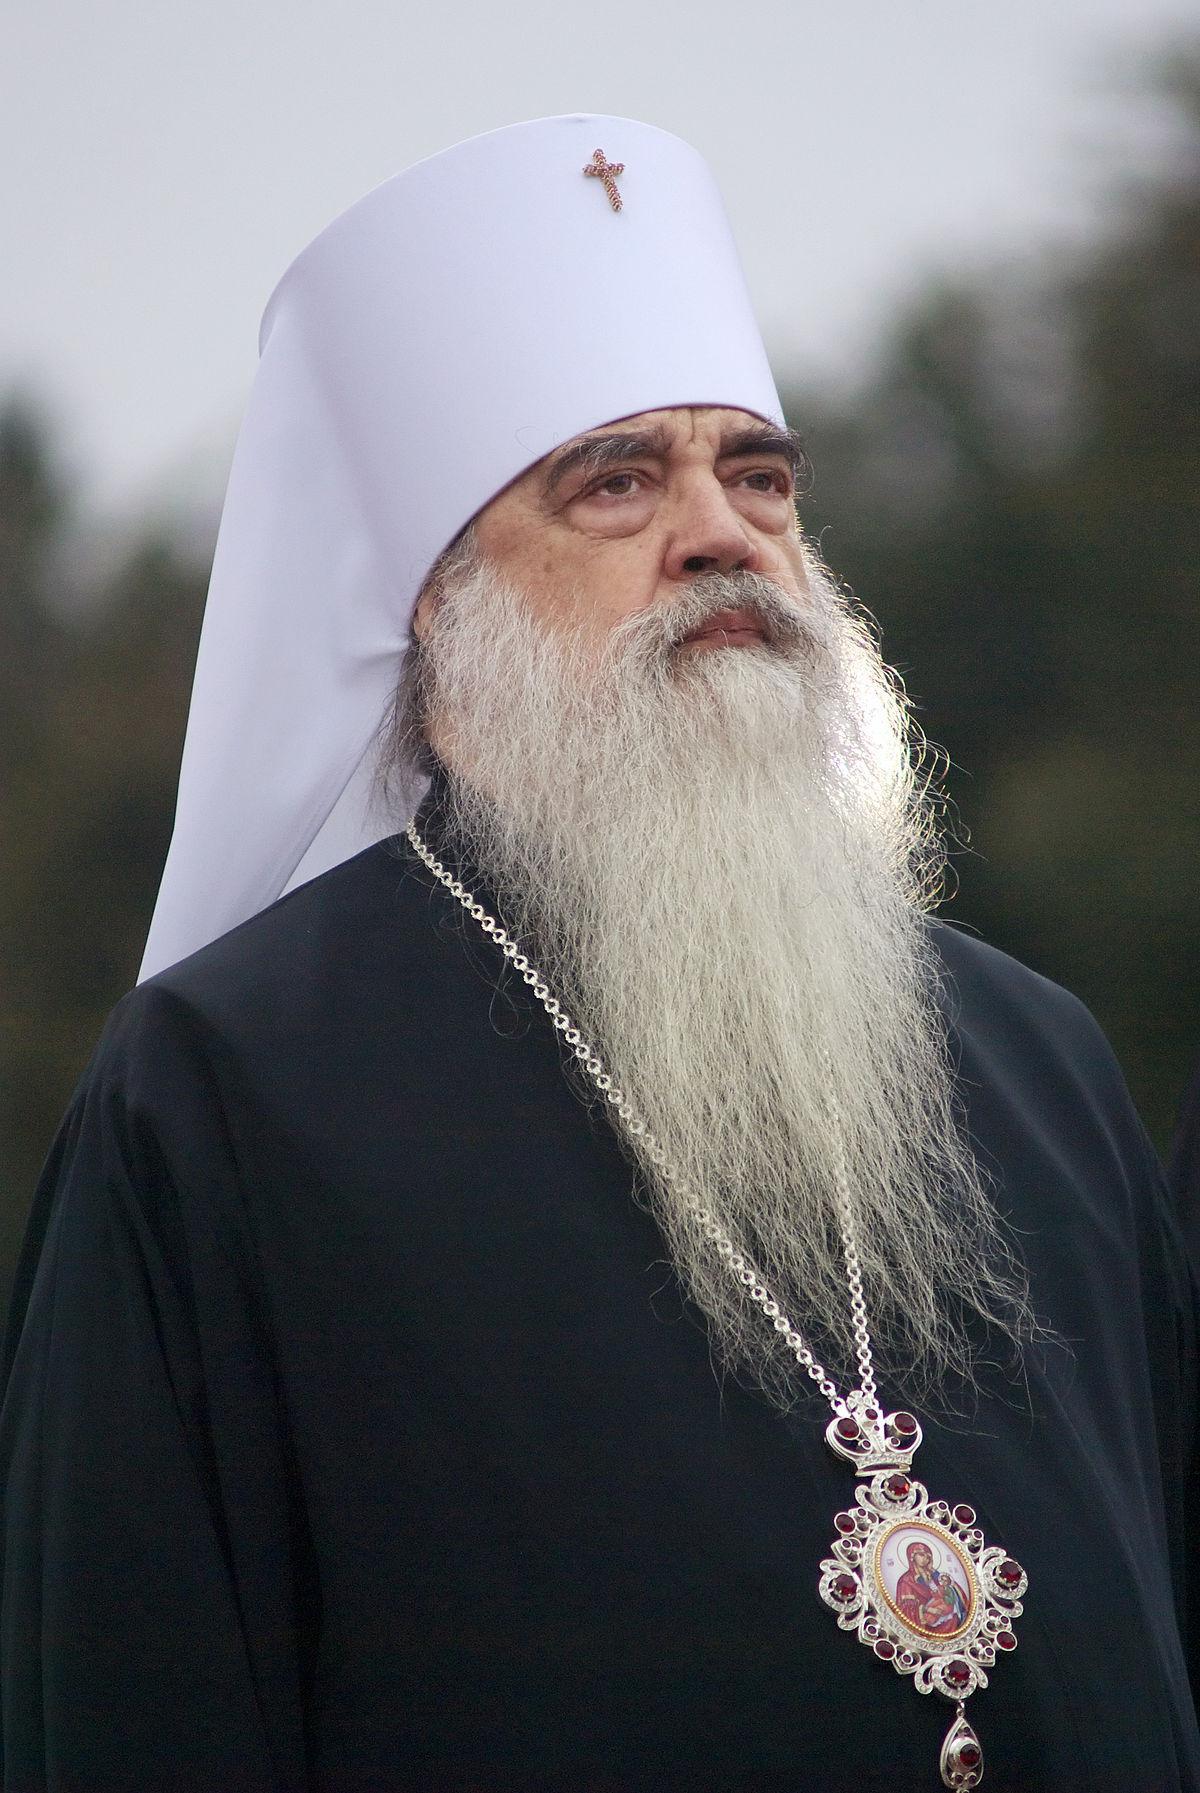 Митрополит Филарет (Вахромеев) / ru.wikipedia.org